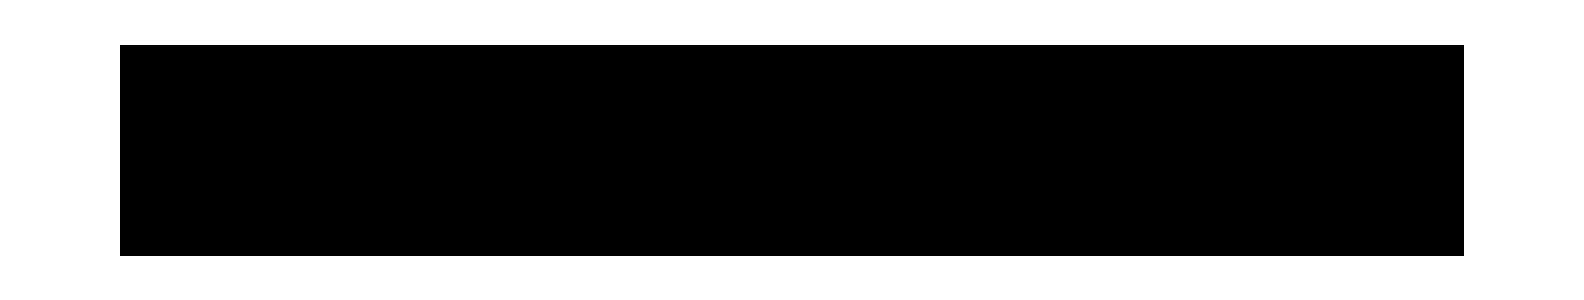 Precor-Logo-Black